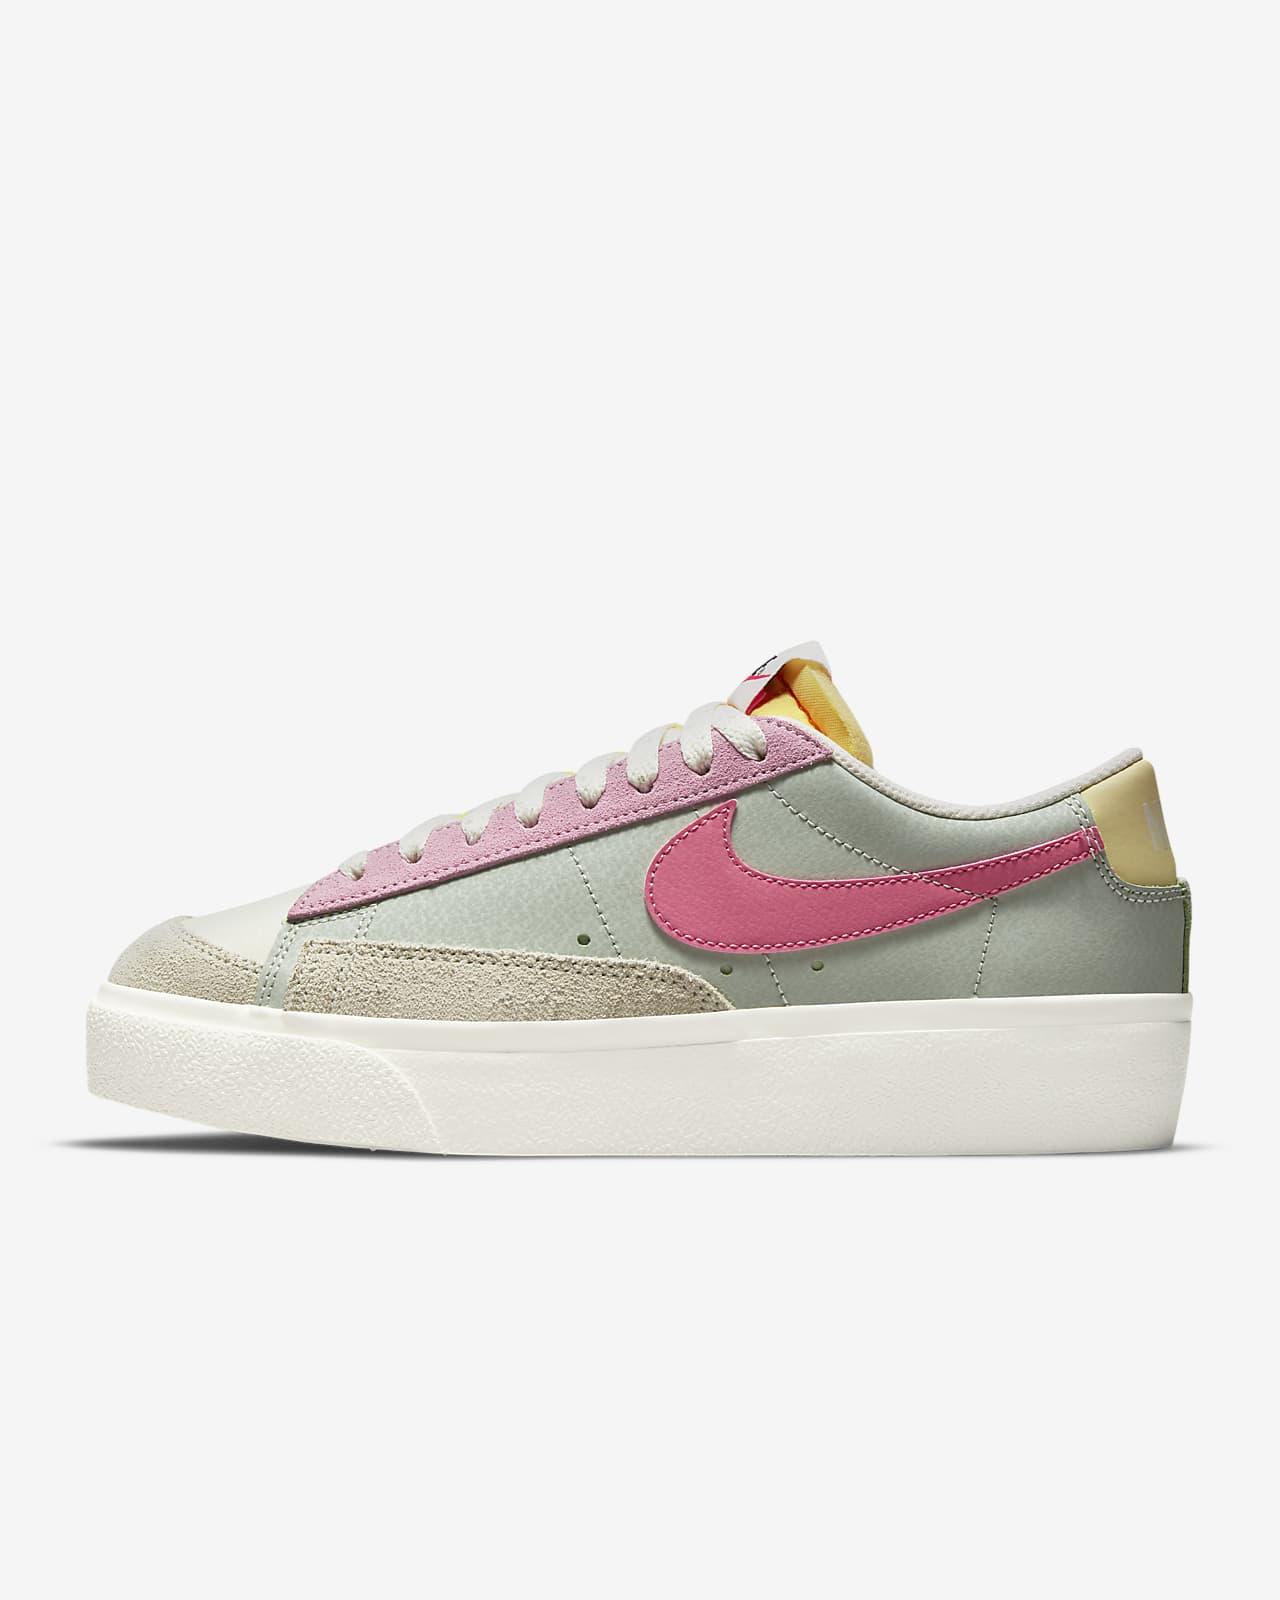 Chaussure Nike Blazer Low Platform pour Femme